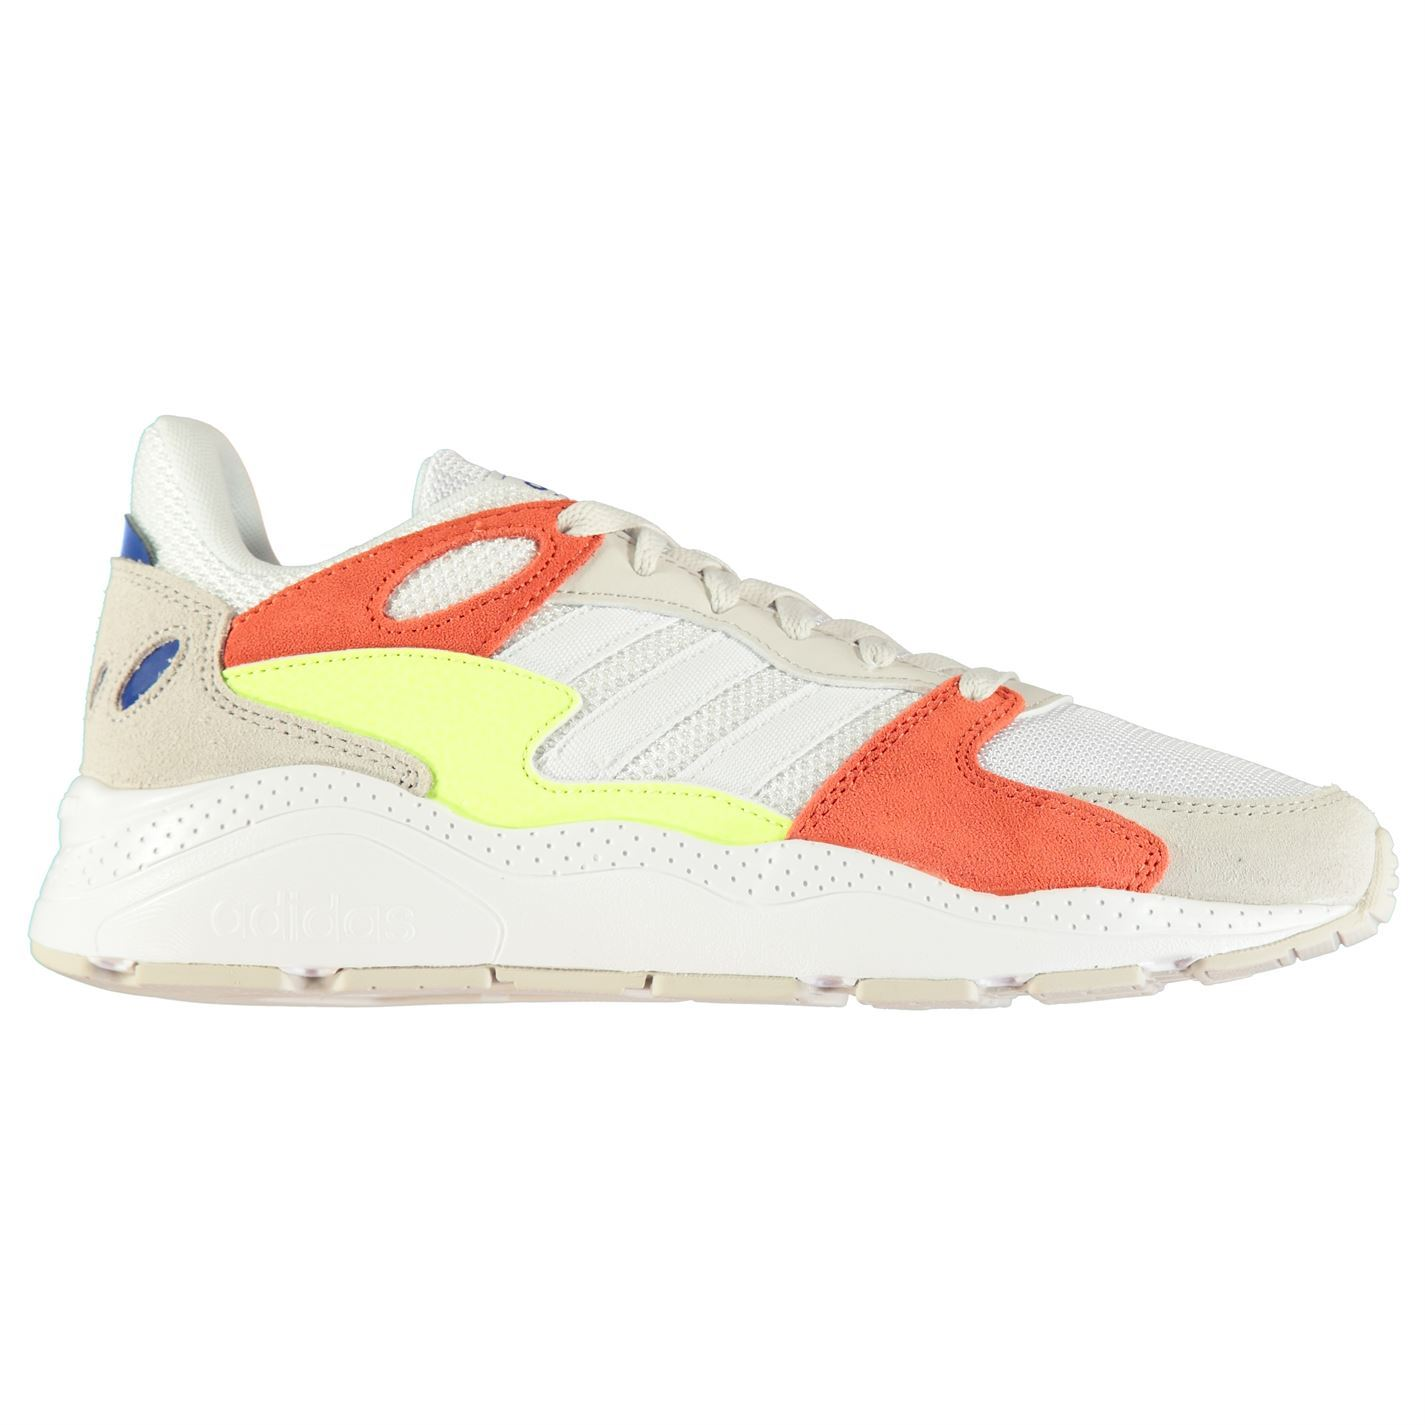 Adidas-Crazychaos-Baskets-Homme-Chaussures-De-Loisirs-Chaussures-Baskets miniature 26